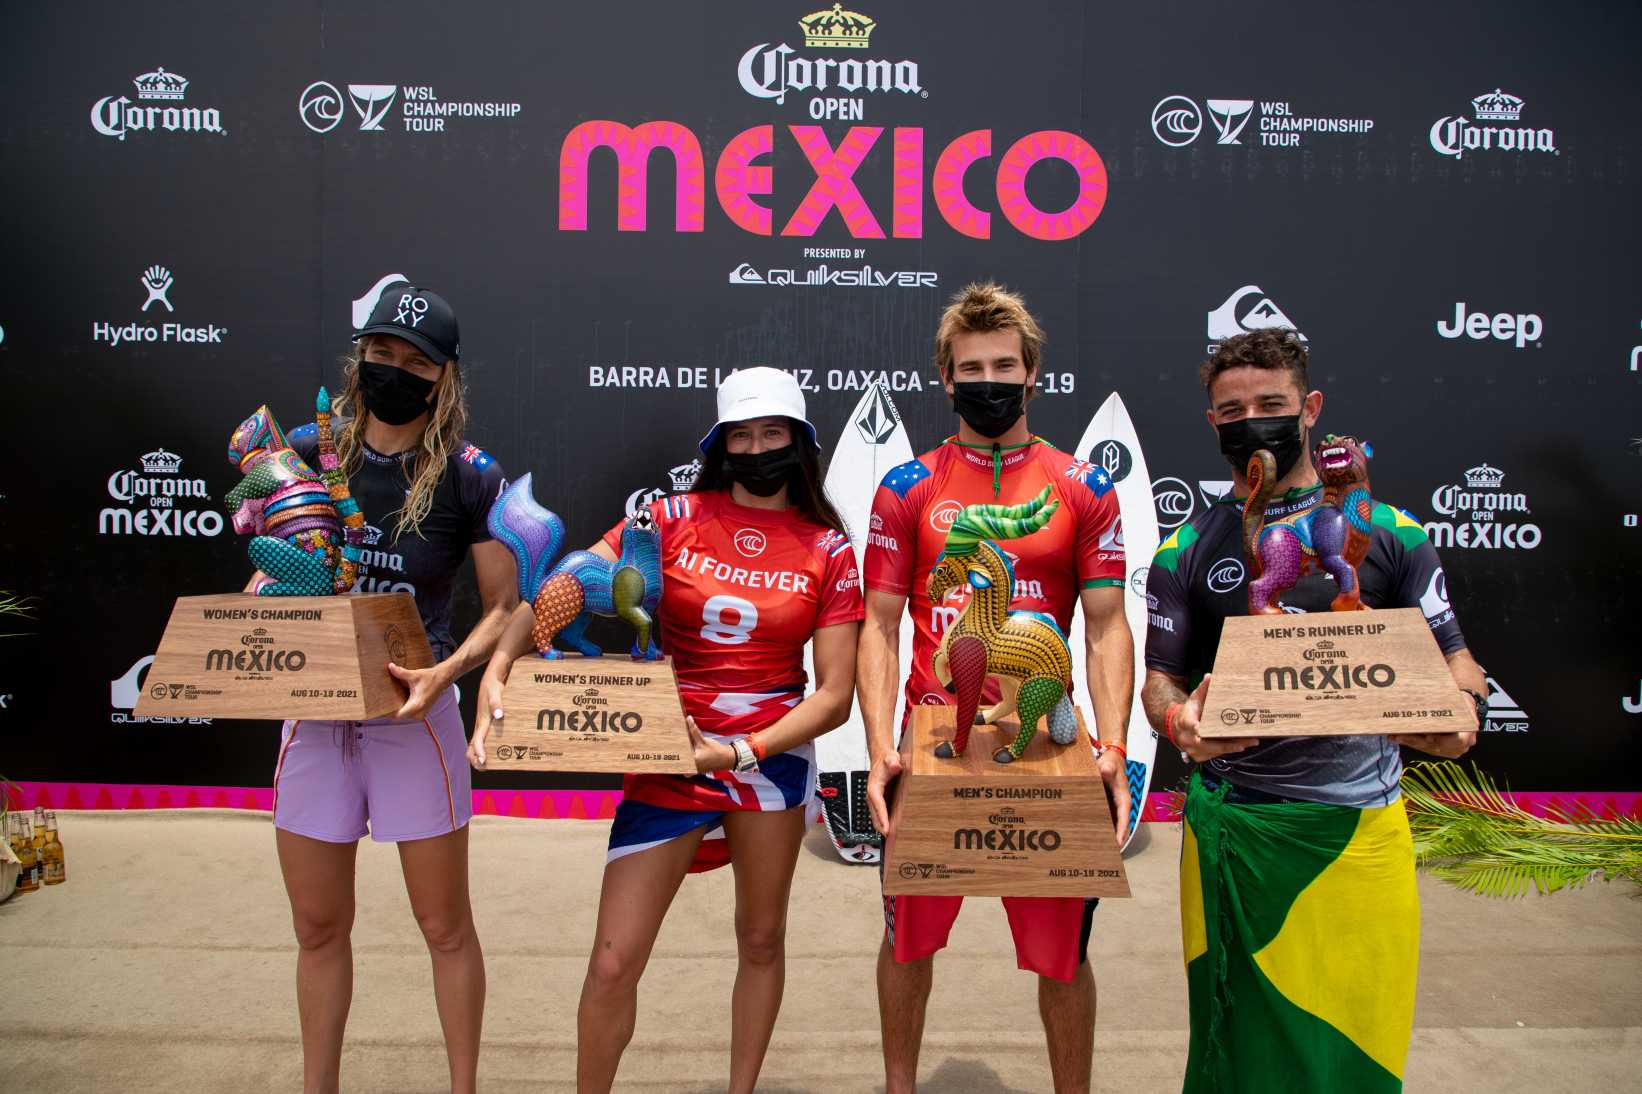 surf30 corona open mexico Finalists 21Mex Heff TYH 1290